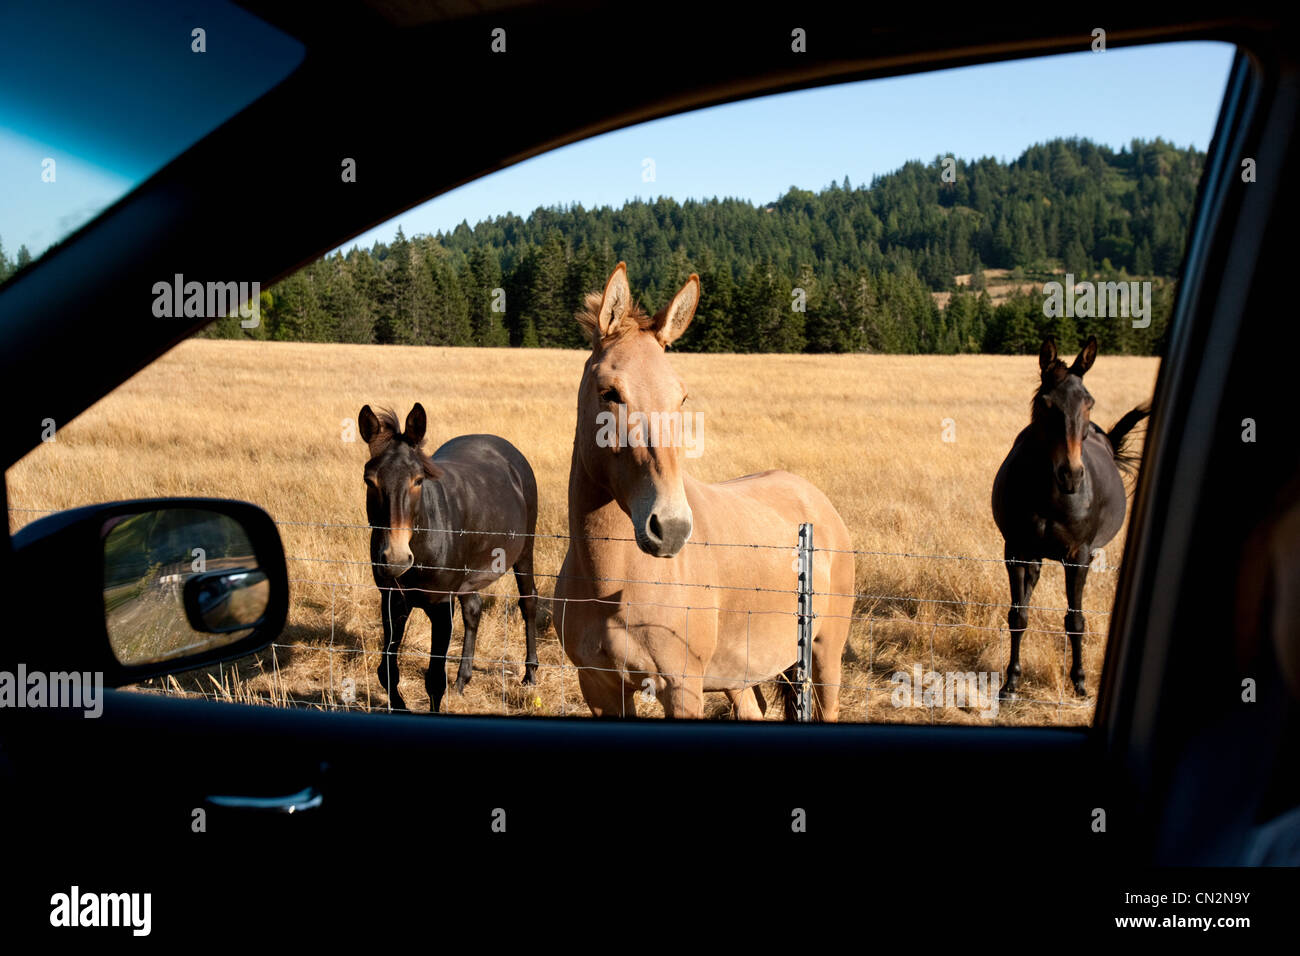 Horses seen through car window - Stock Image